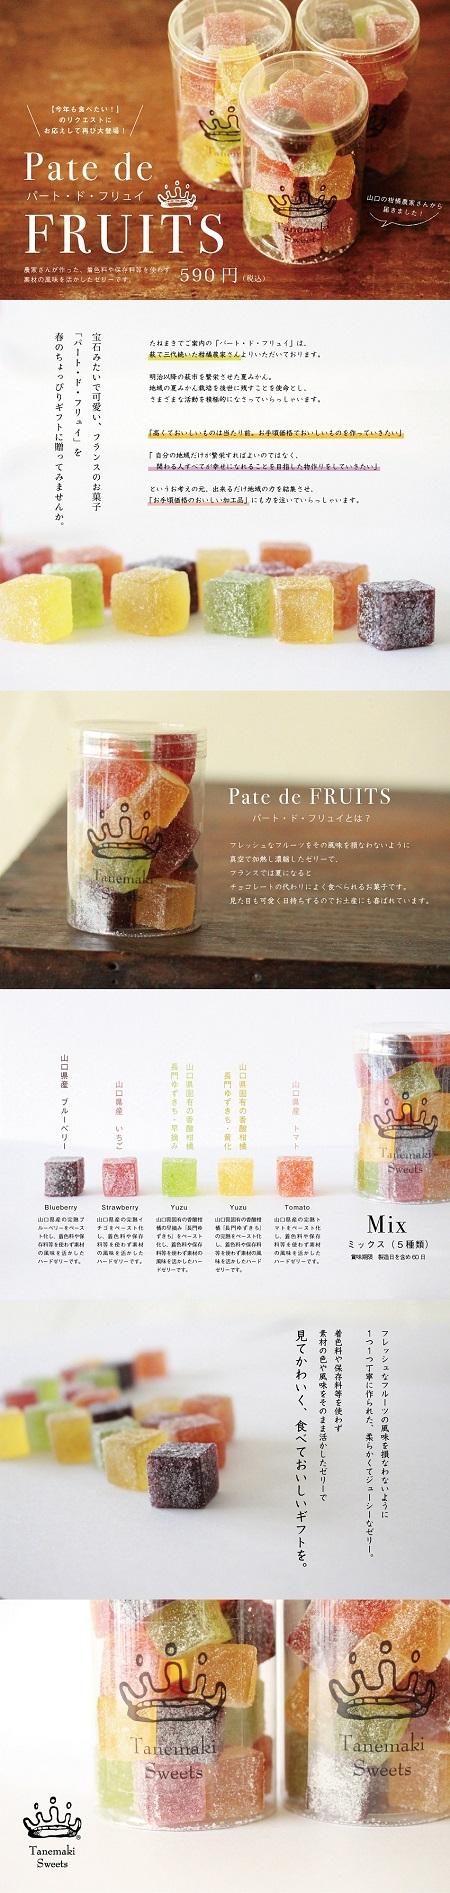 2021_Pate_de_Fruits450px.jpg